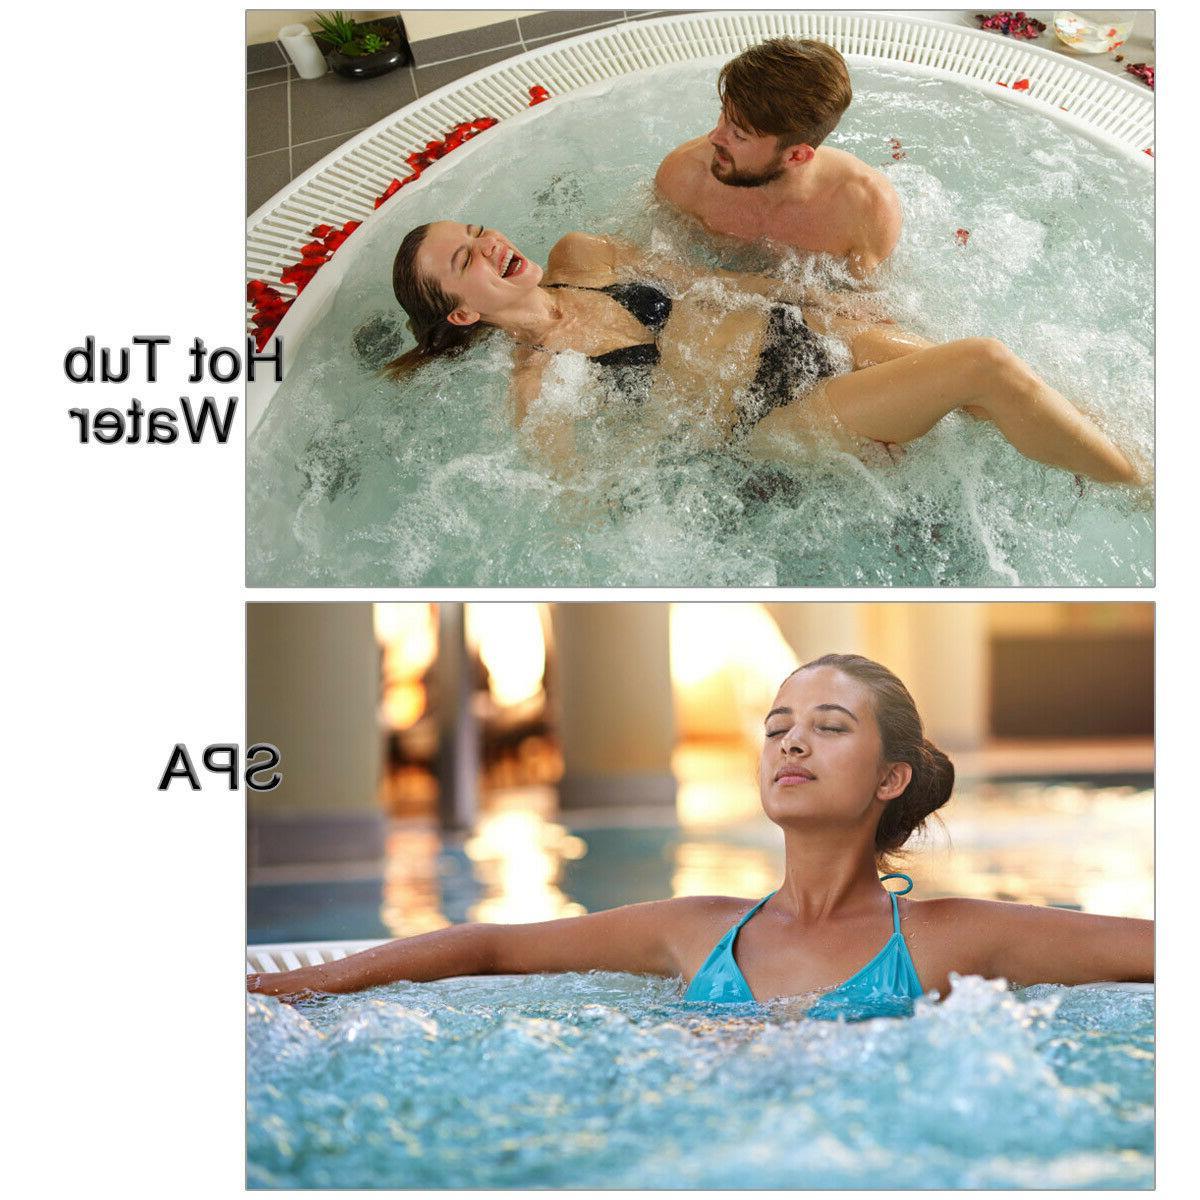 Mineral Mineral Stick,Water Filter Hot tub Pools